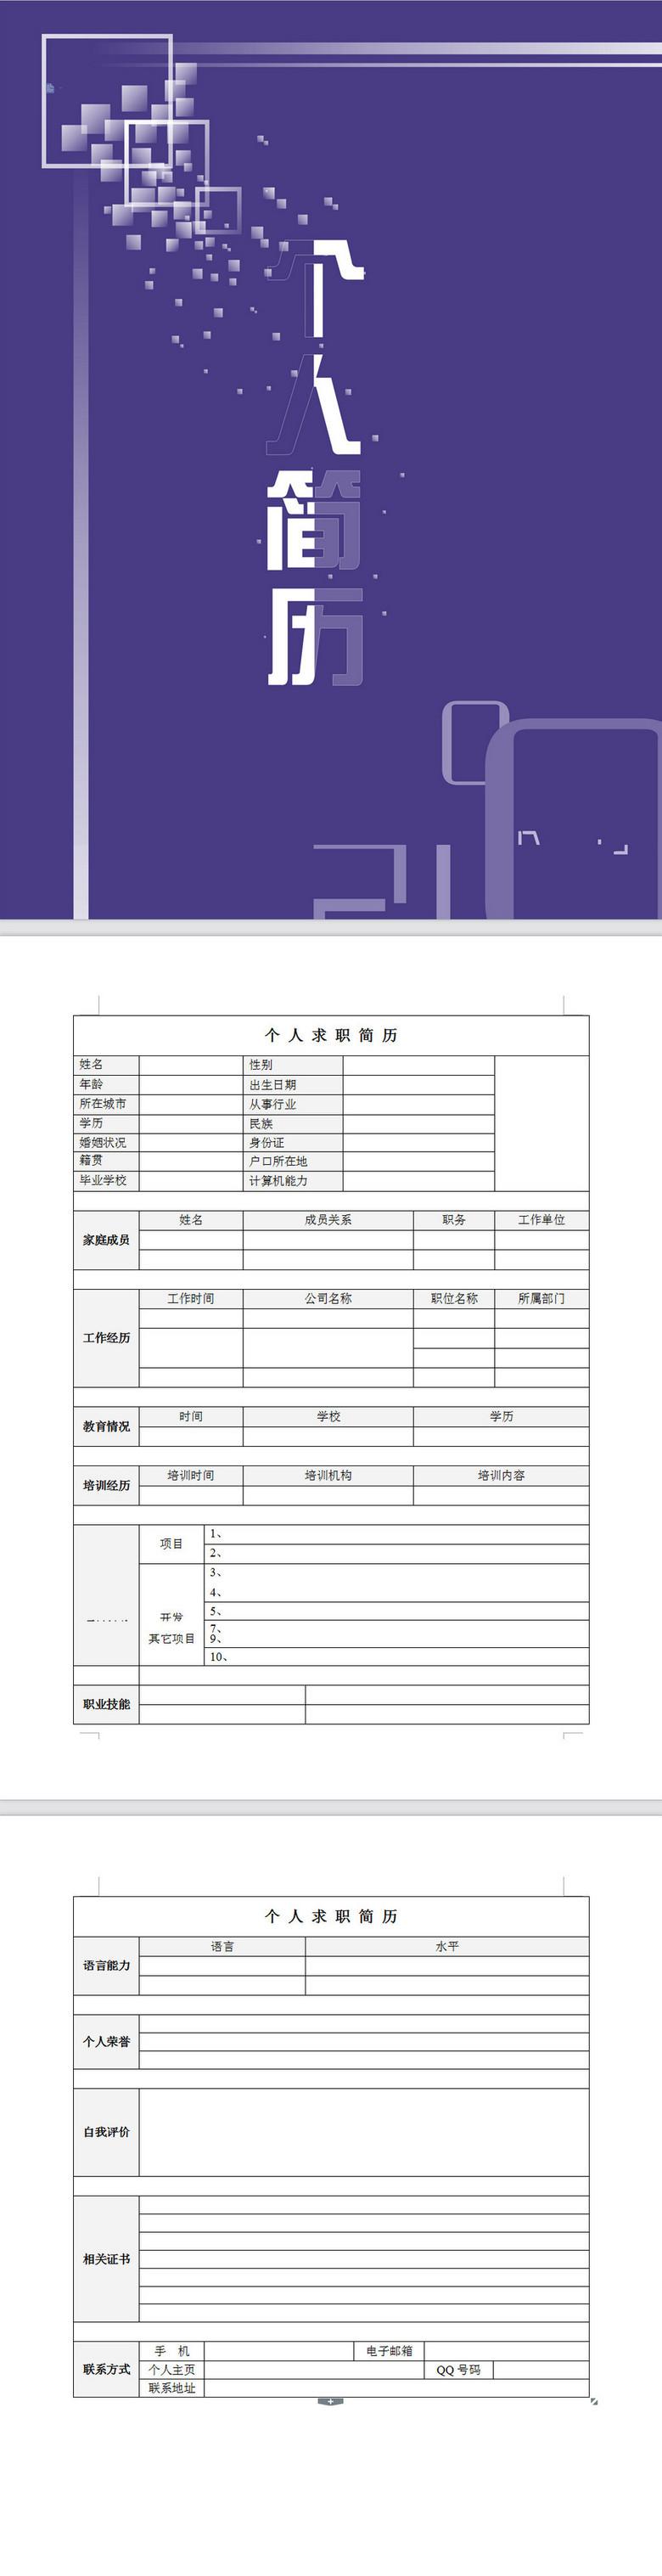 word文档 简历模板 个人简历模板 > 个性彩色求职简历word模板  版权图片